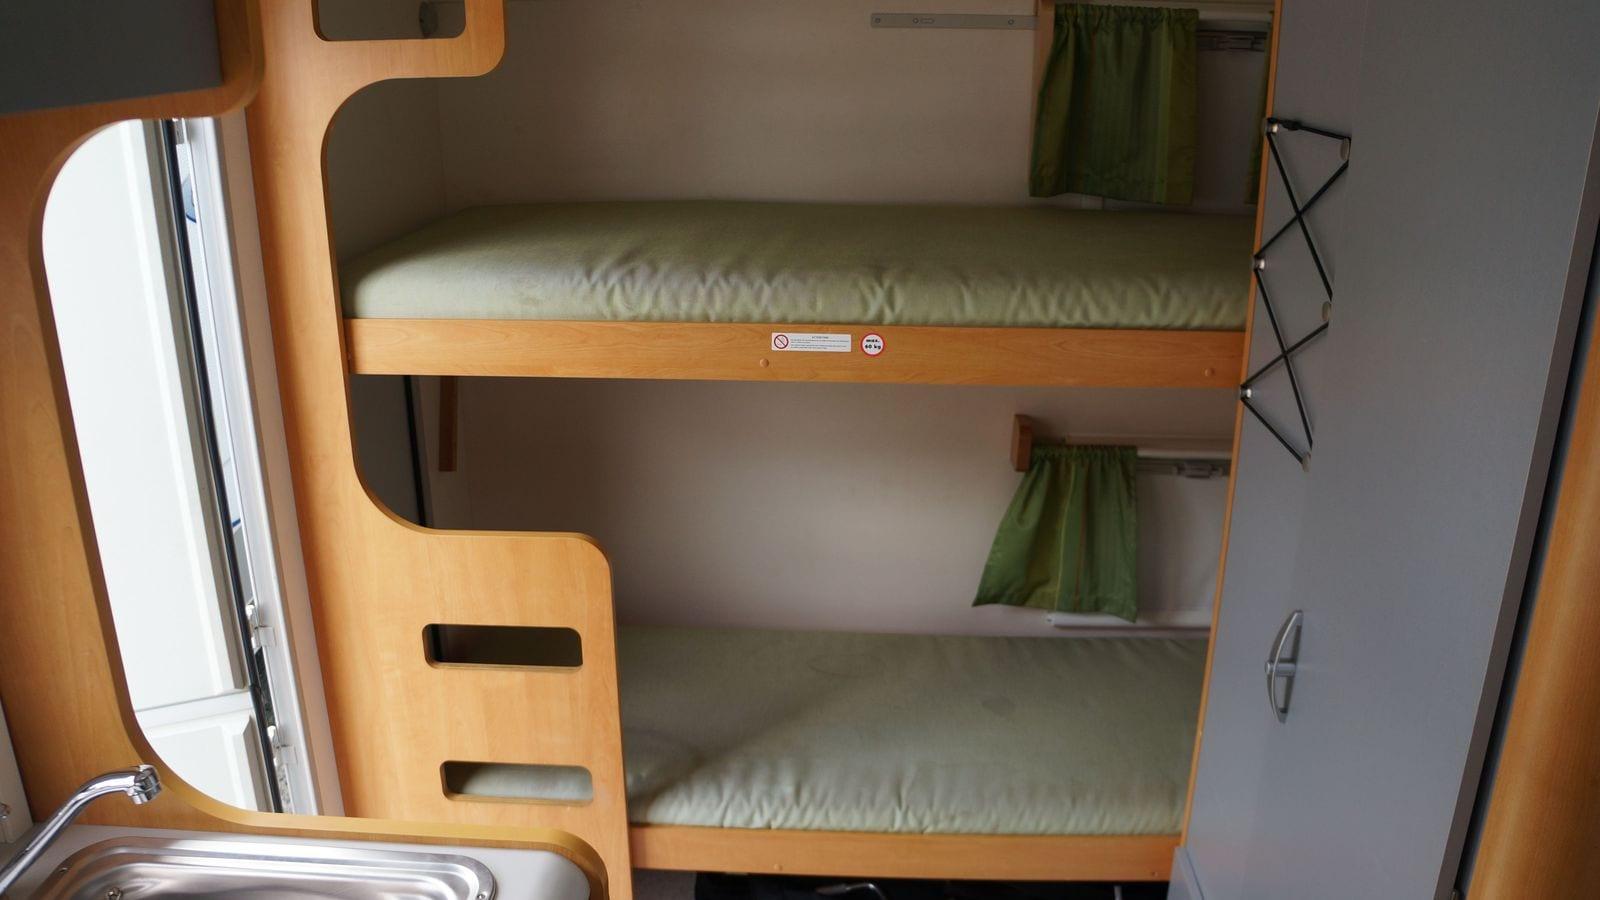 csm_camp-groen-koejer_e9ecbe6736